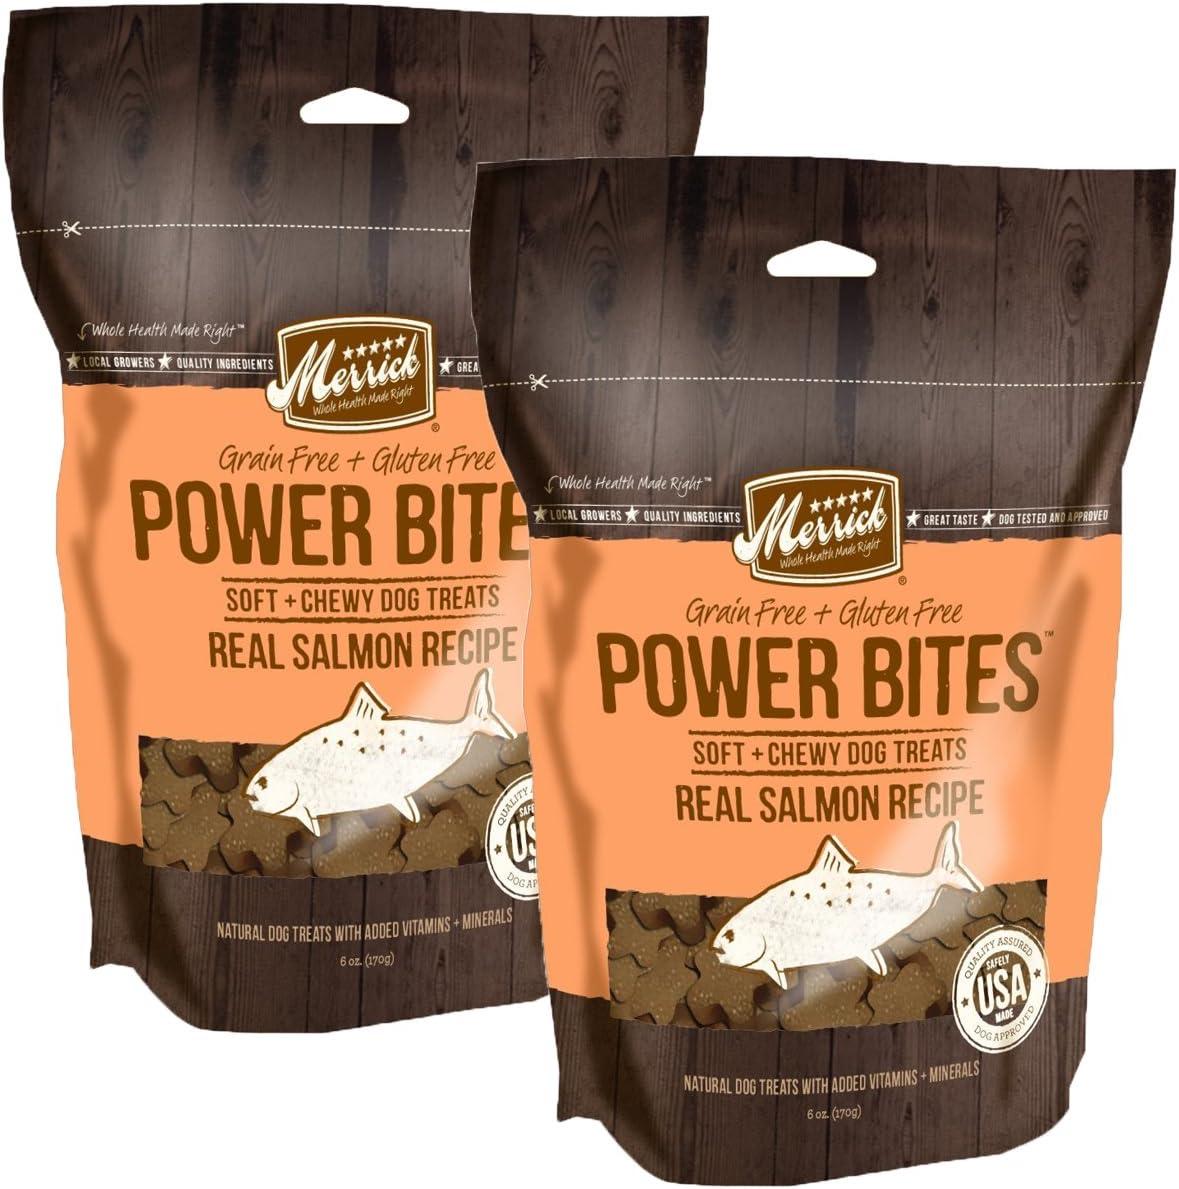 Merrick Grain Free Gluten Free Power Bites Dog Treats, 6 oz